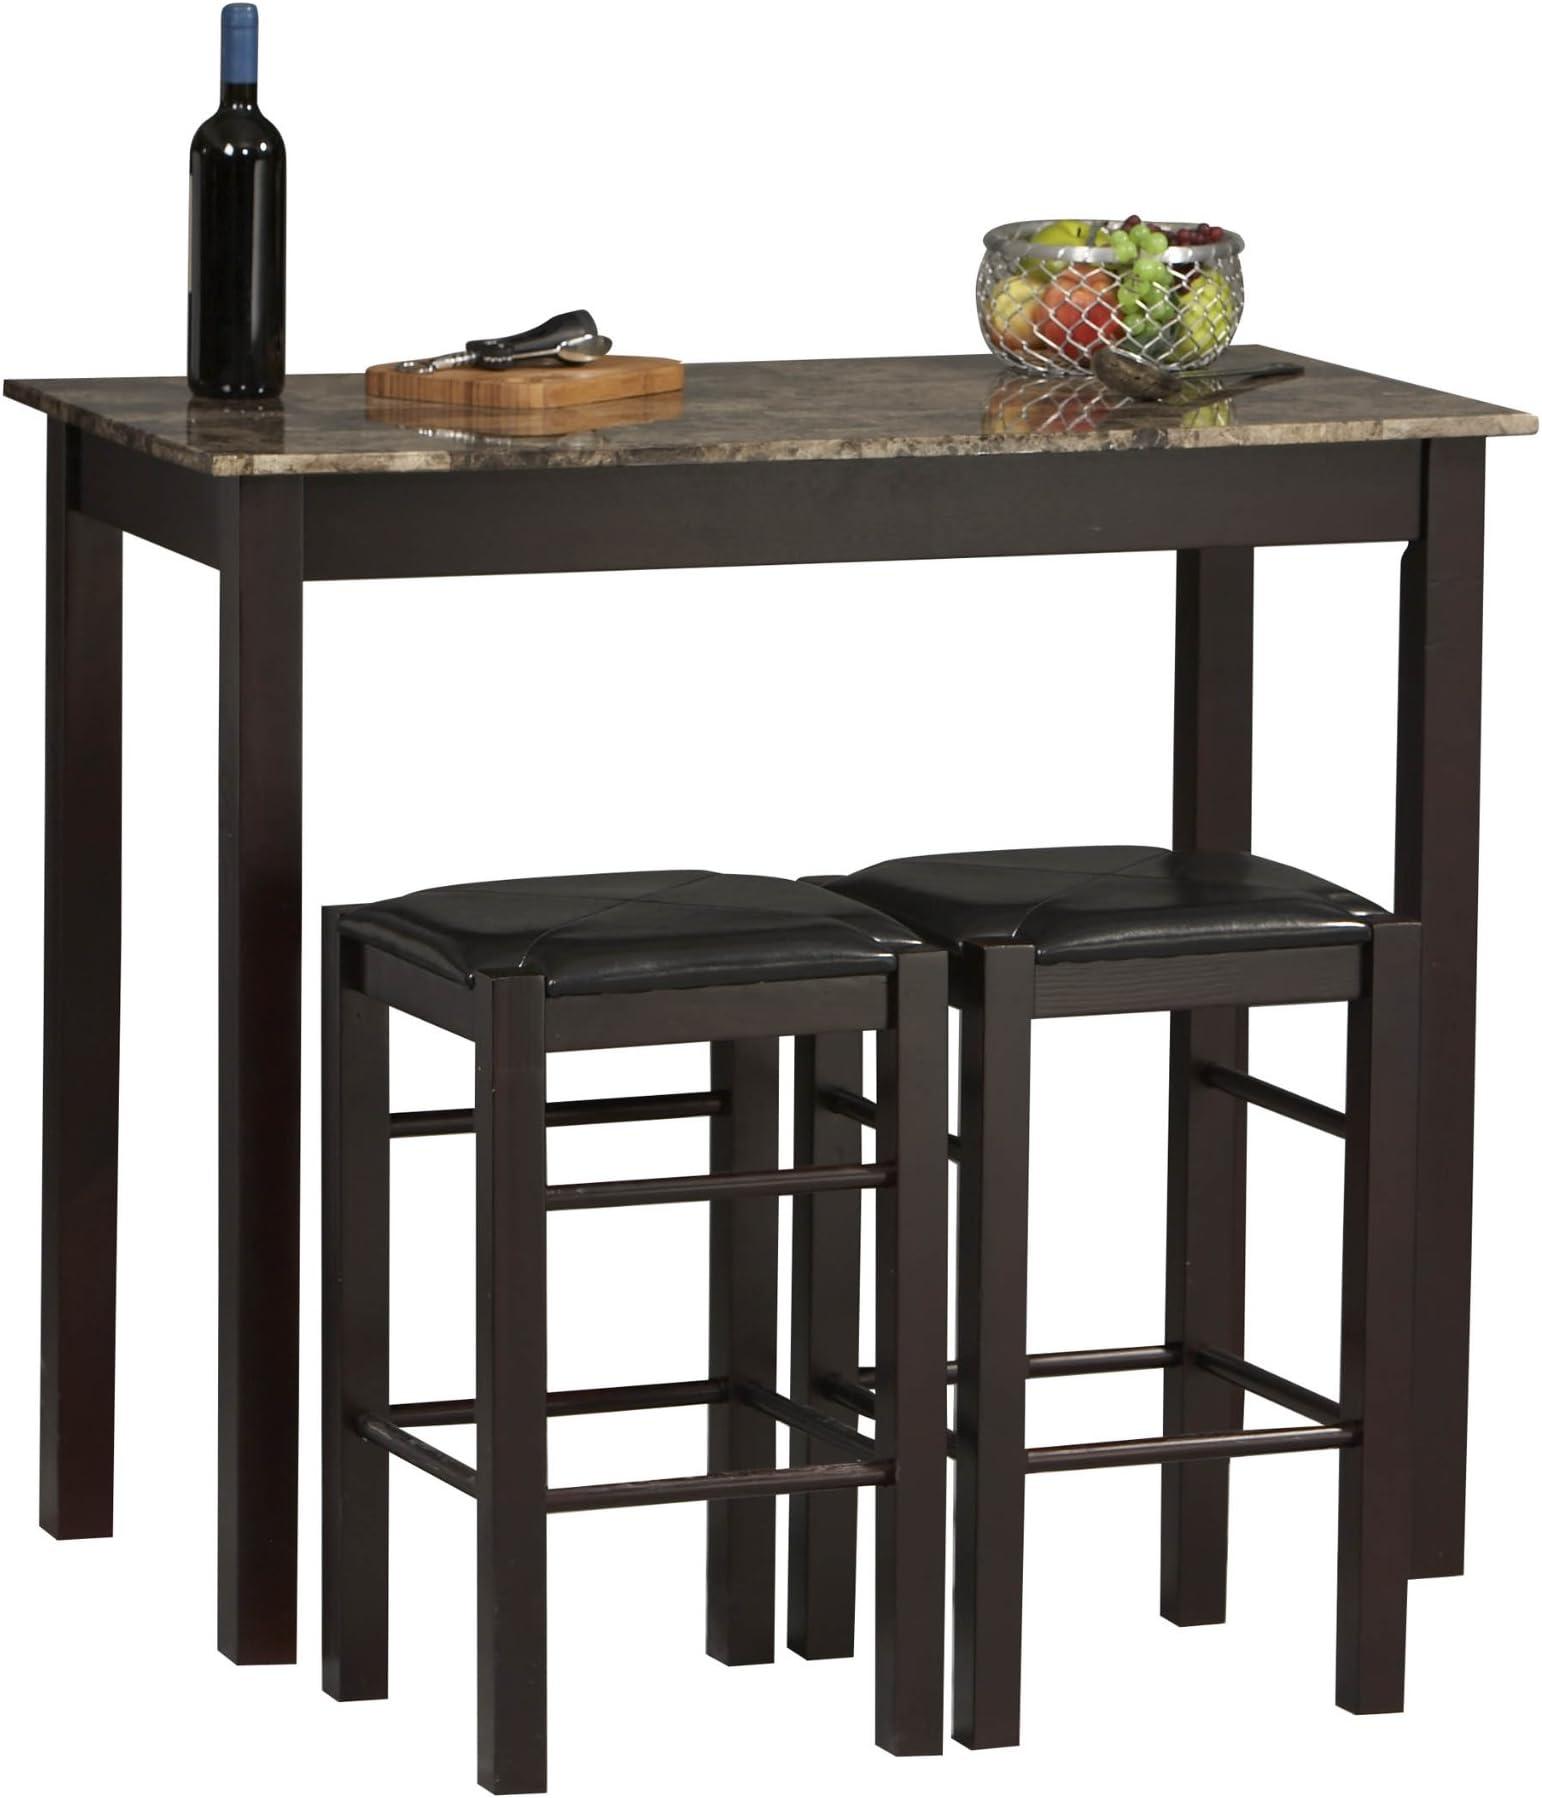 Linon Tavern Collection 3-Piece Table Set  sc 1 st  Amazon.com & Table \u0026 Chair Sets | Amazon.com